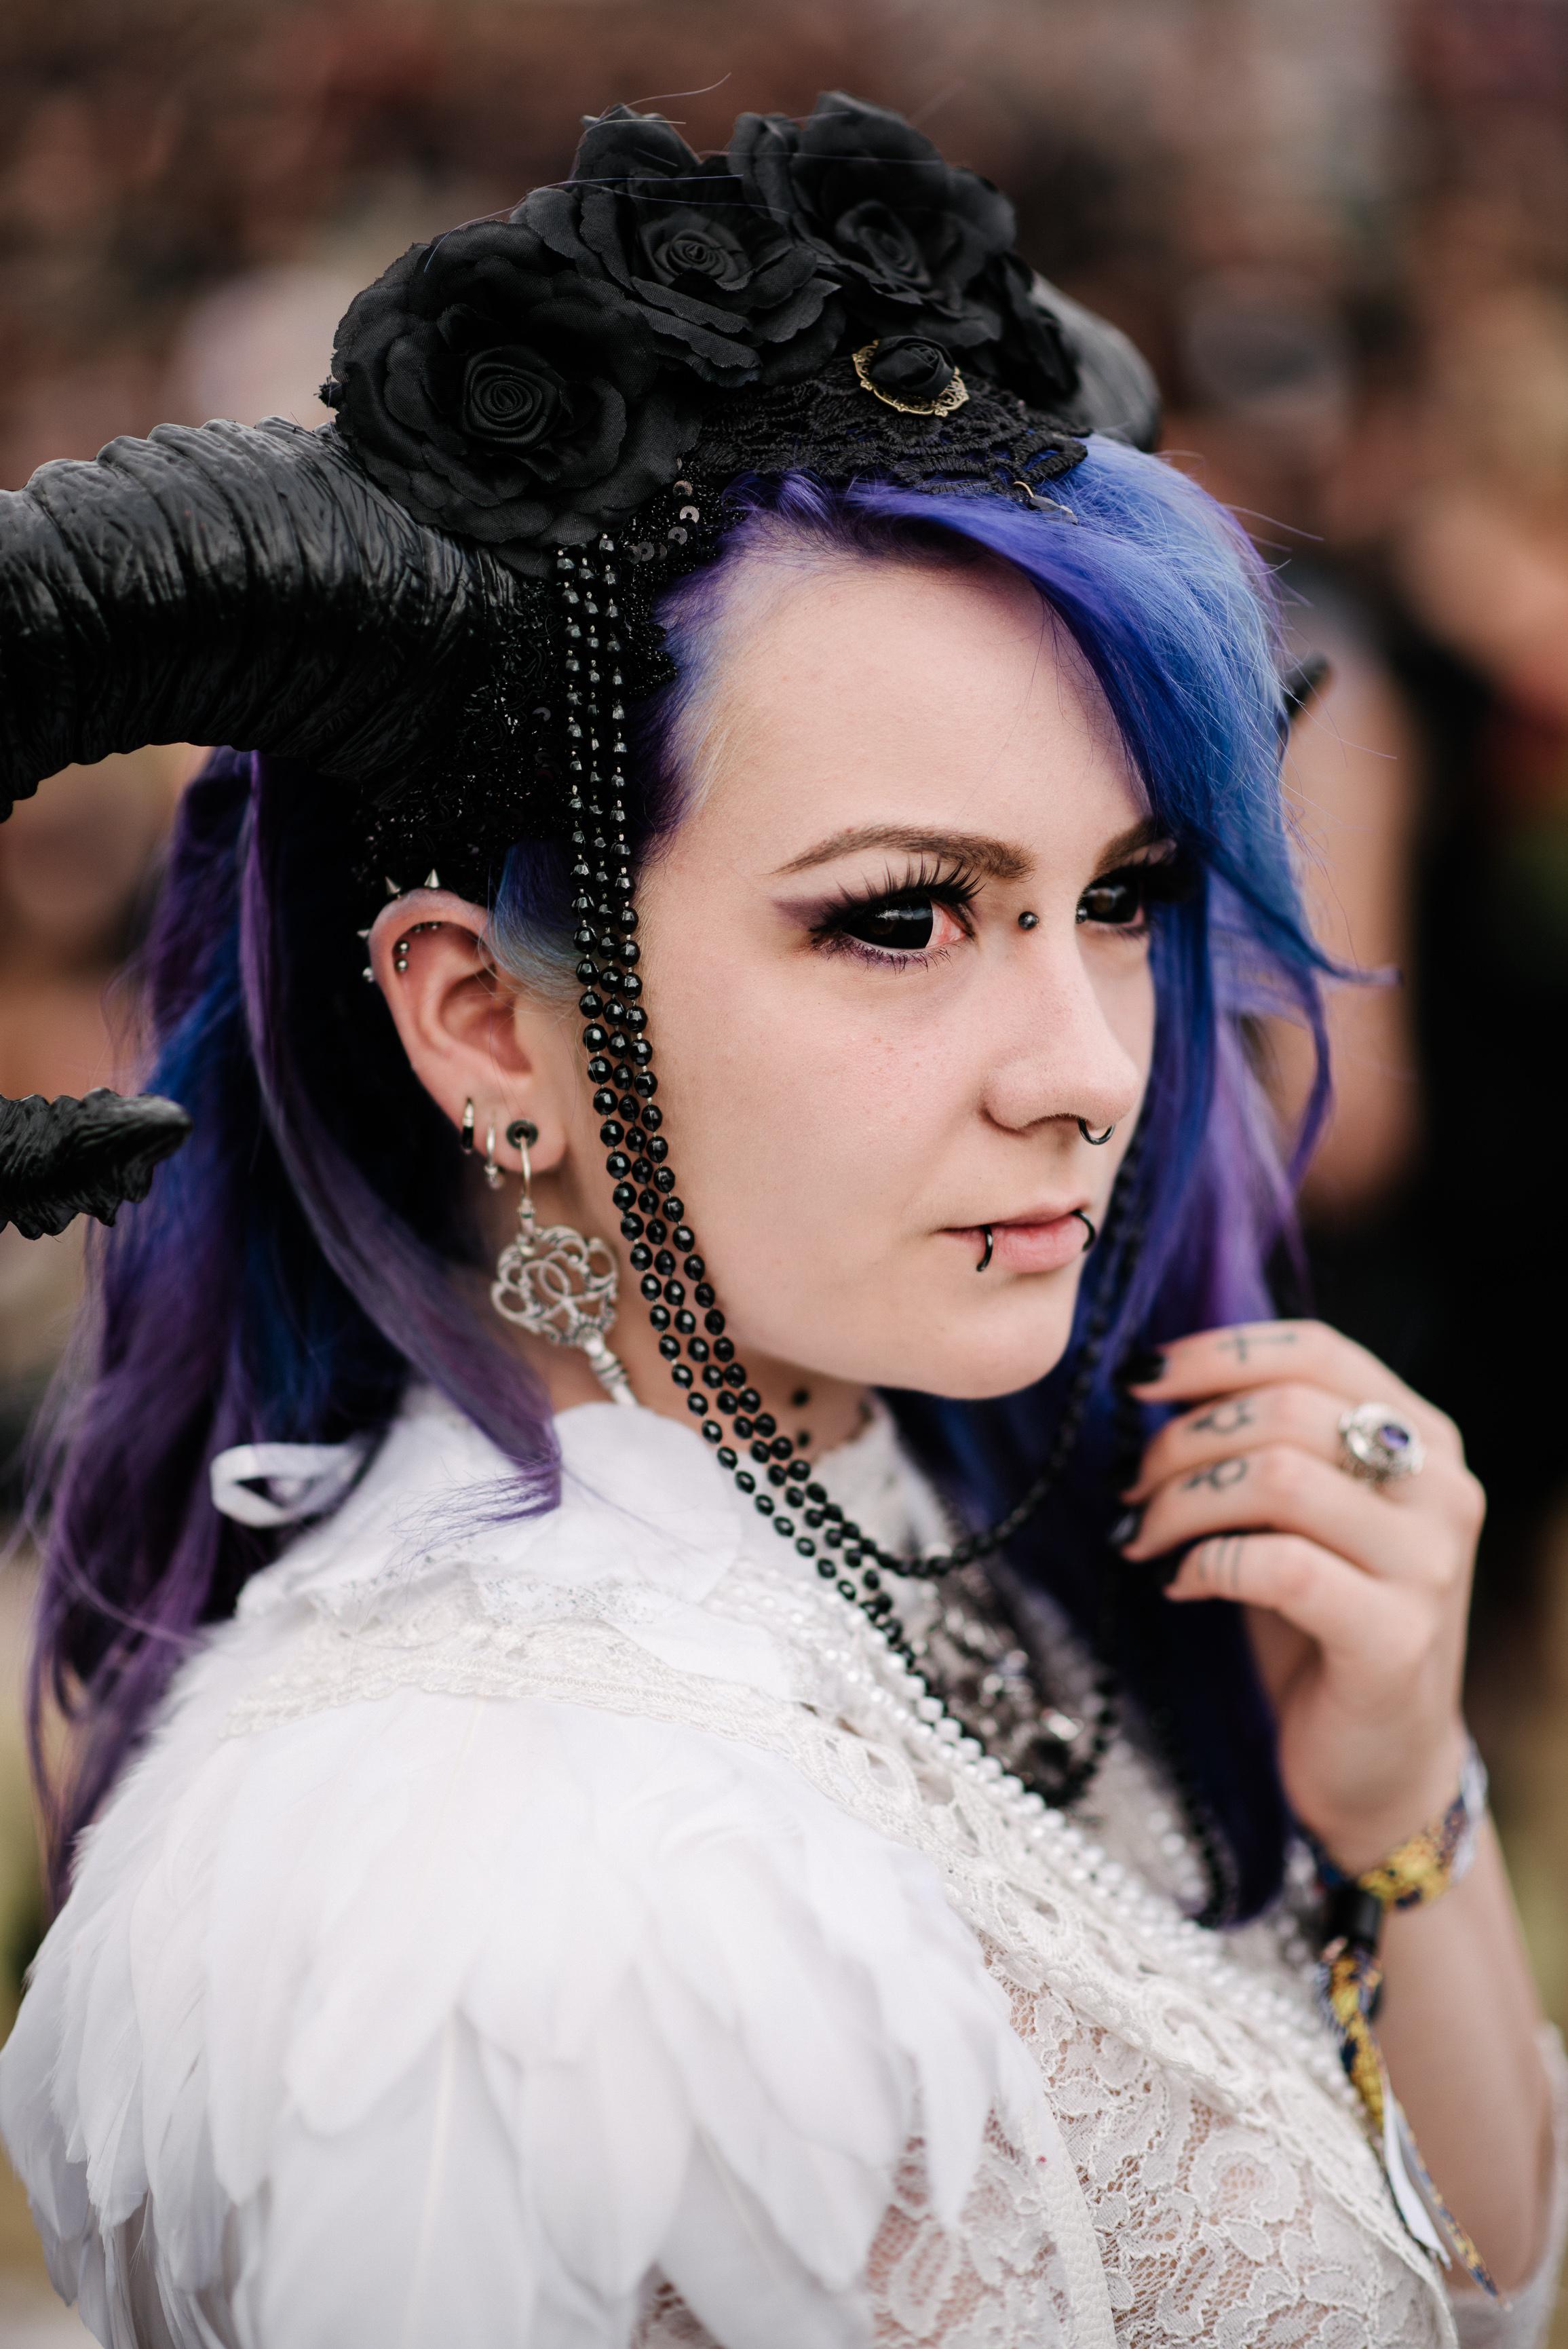 ML_16_Faces of Mera Luna_Robin_Schmiedebach_153429.jpg